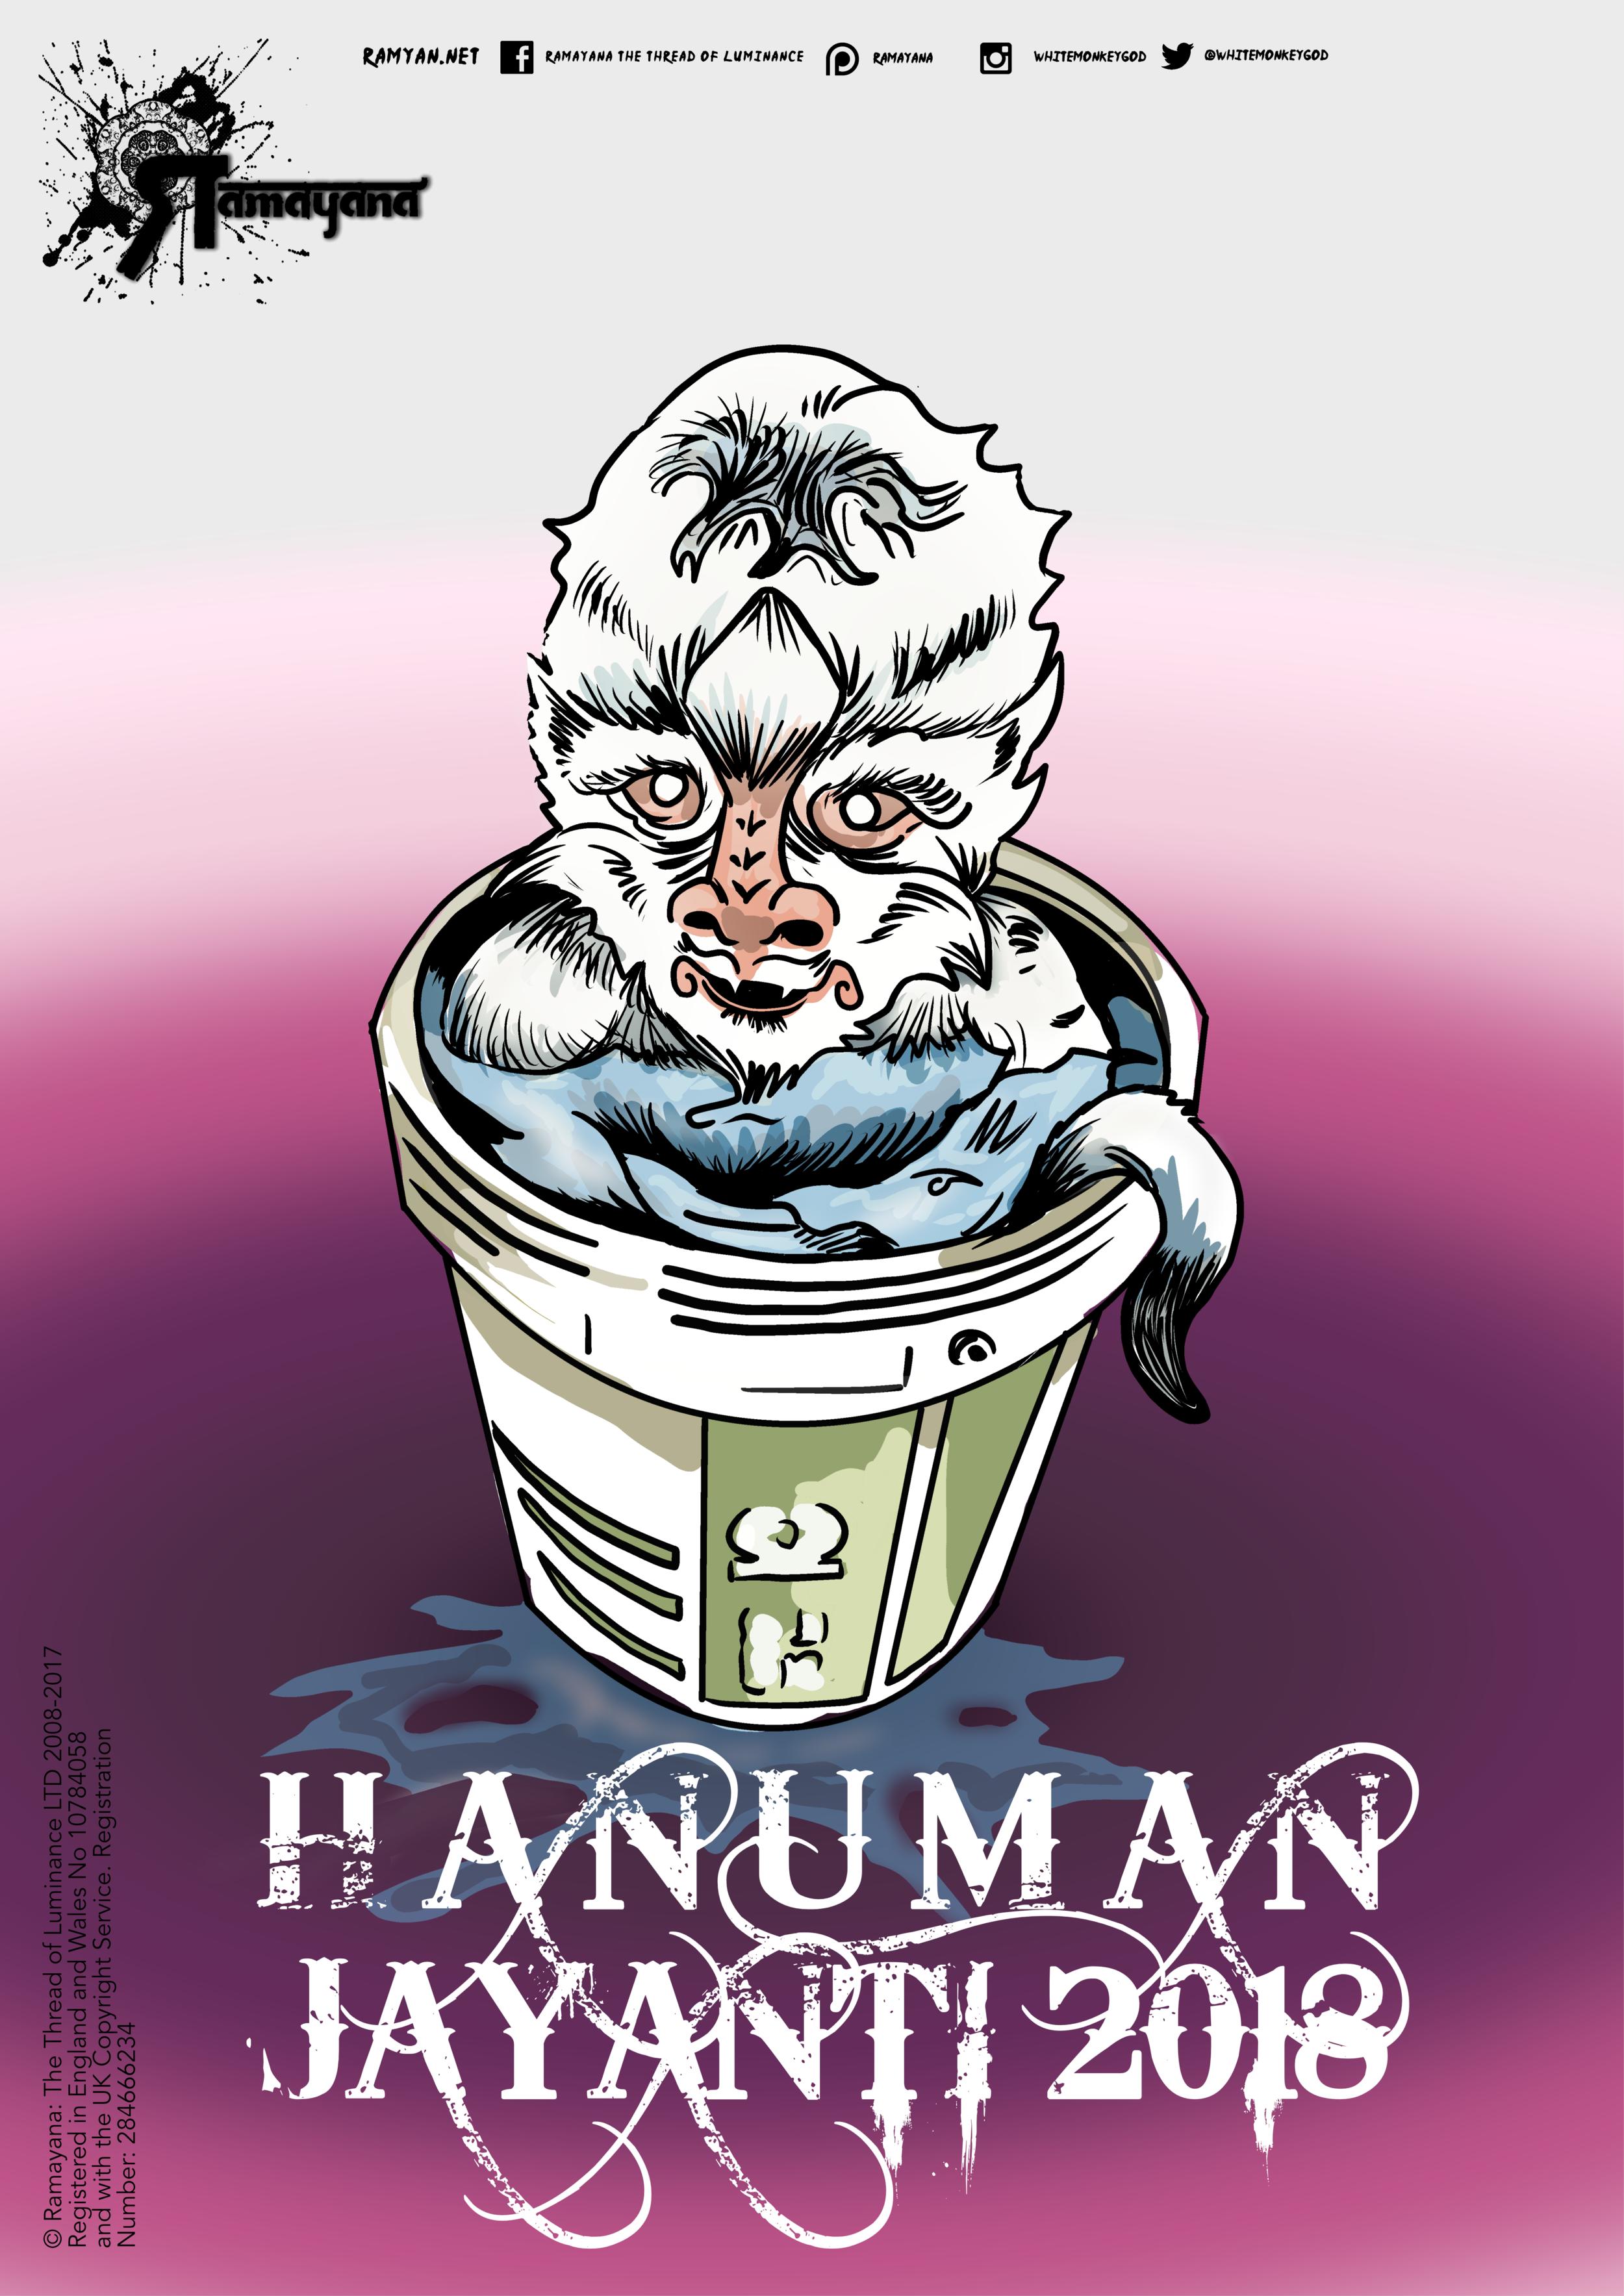 hanumanjayanti.png